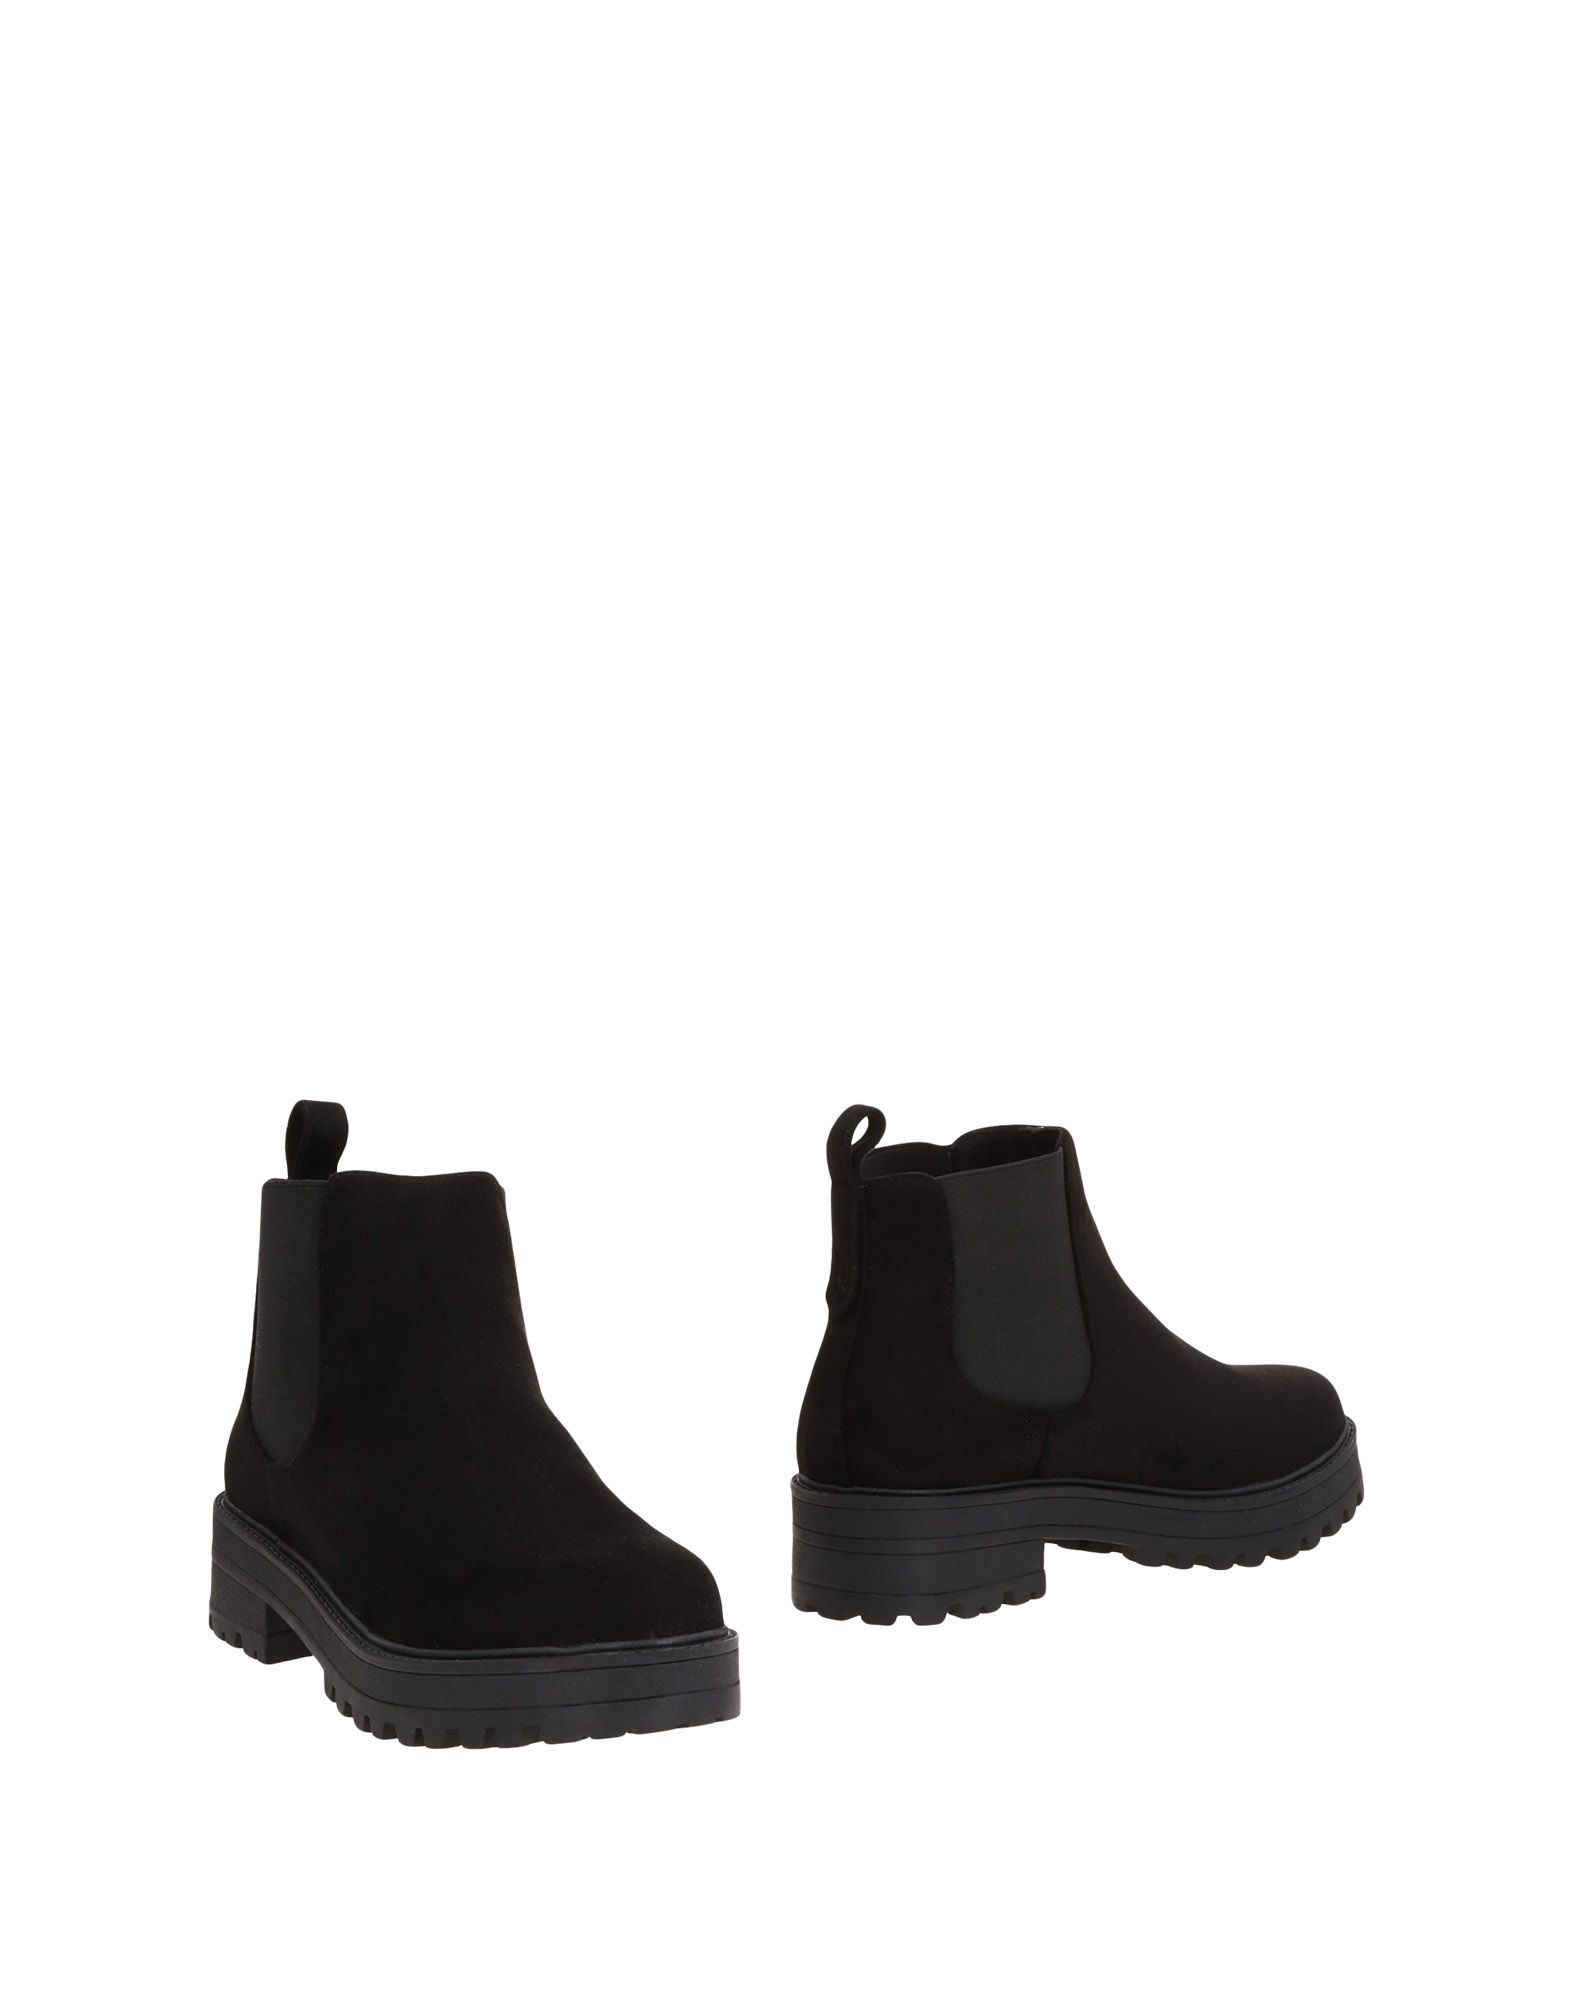 Coolway Chelsea Boots Damen  11464206QV Gute Qualität beliebte Schuhe